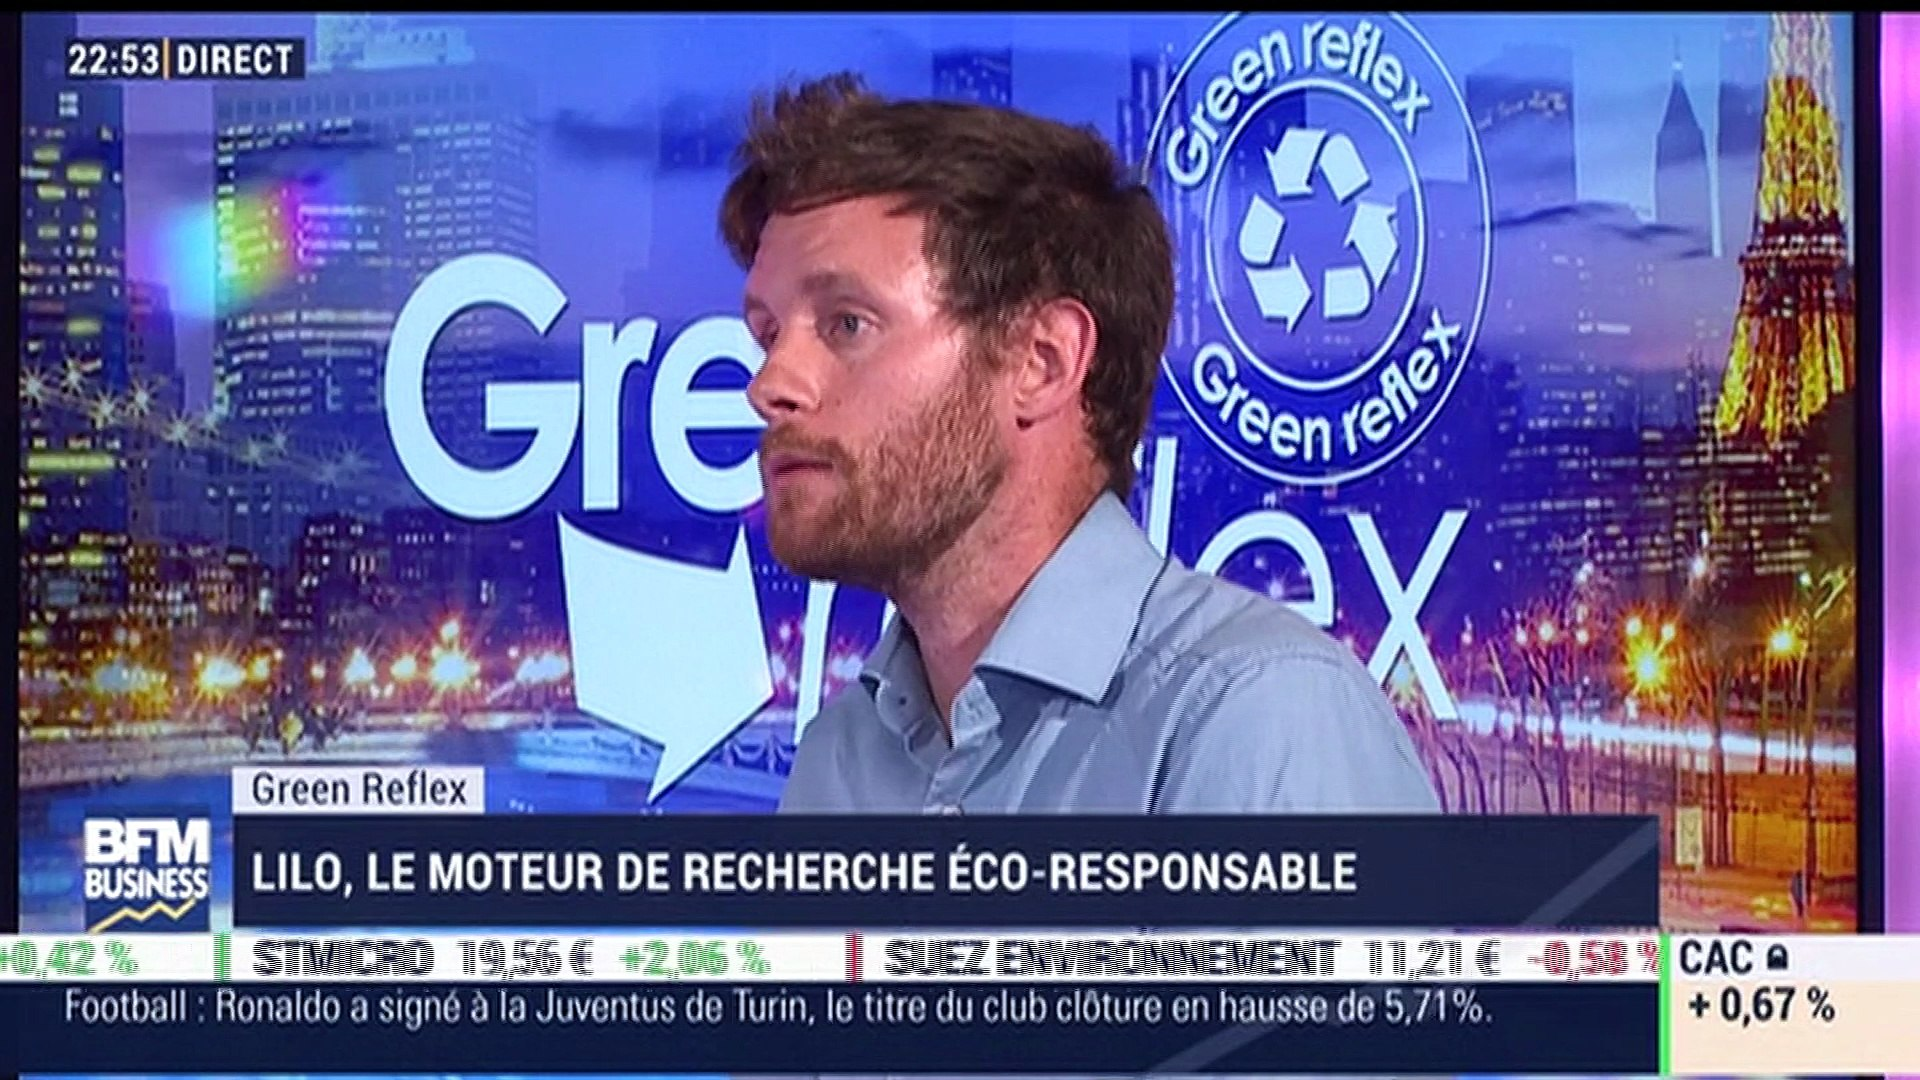 Green Reflex Lilo Le Moteur De Recherche Eco Responsable 10 07